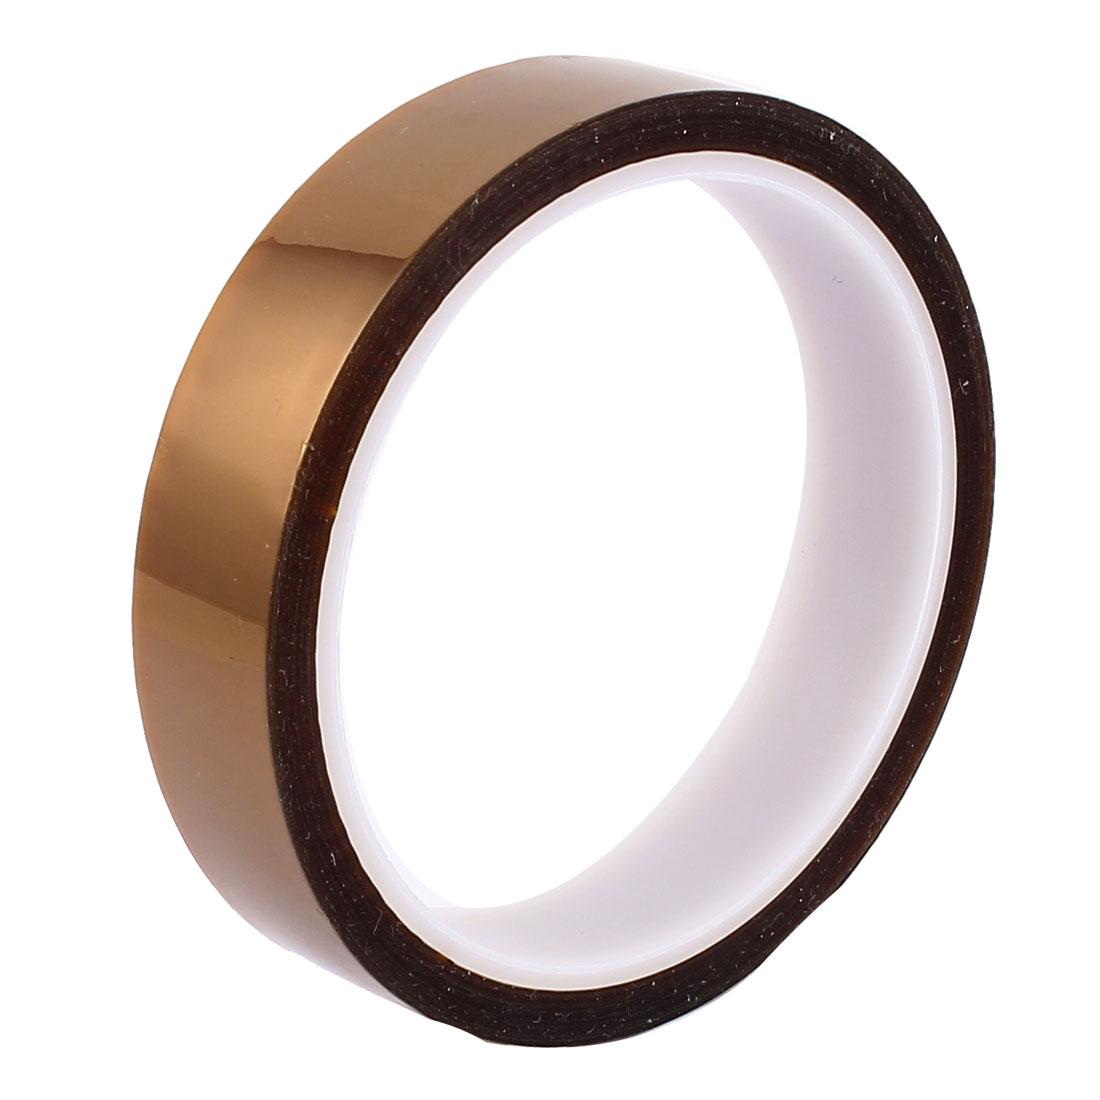 20mm Width 93mm Diameter High Temperature Resistant Tape